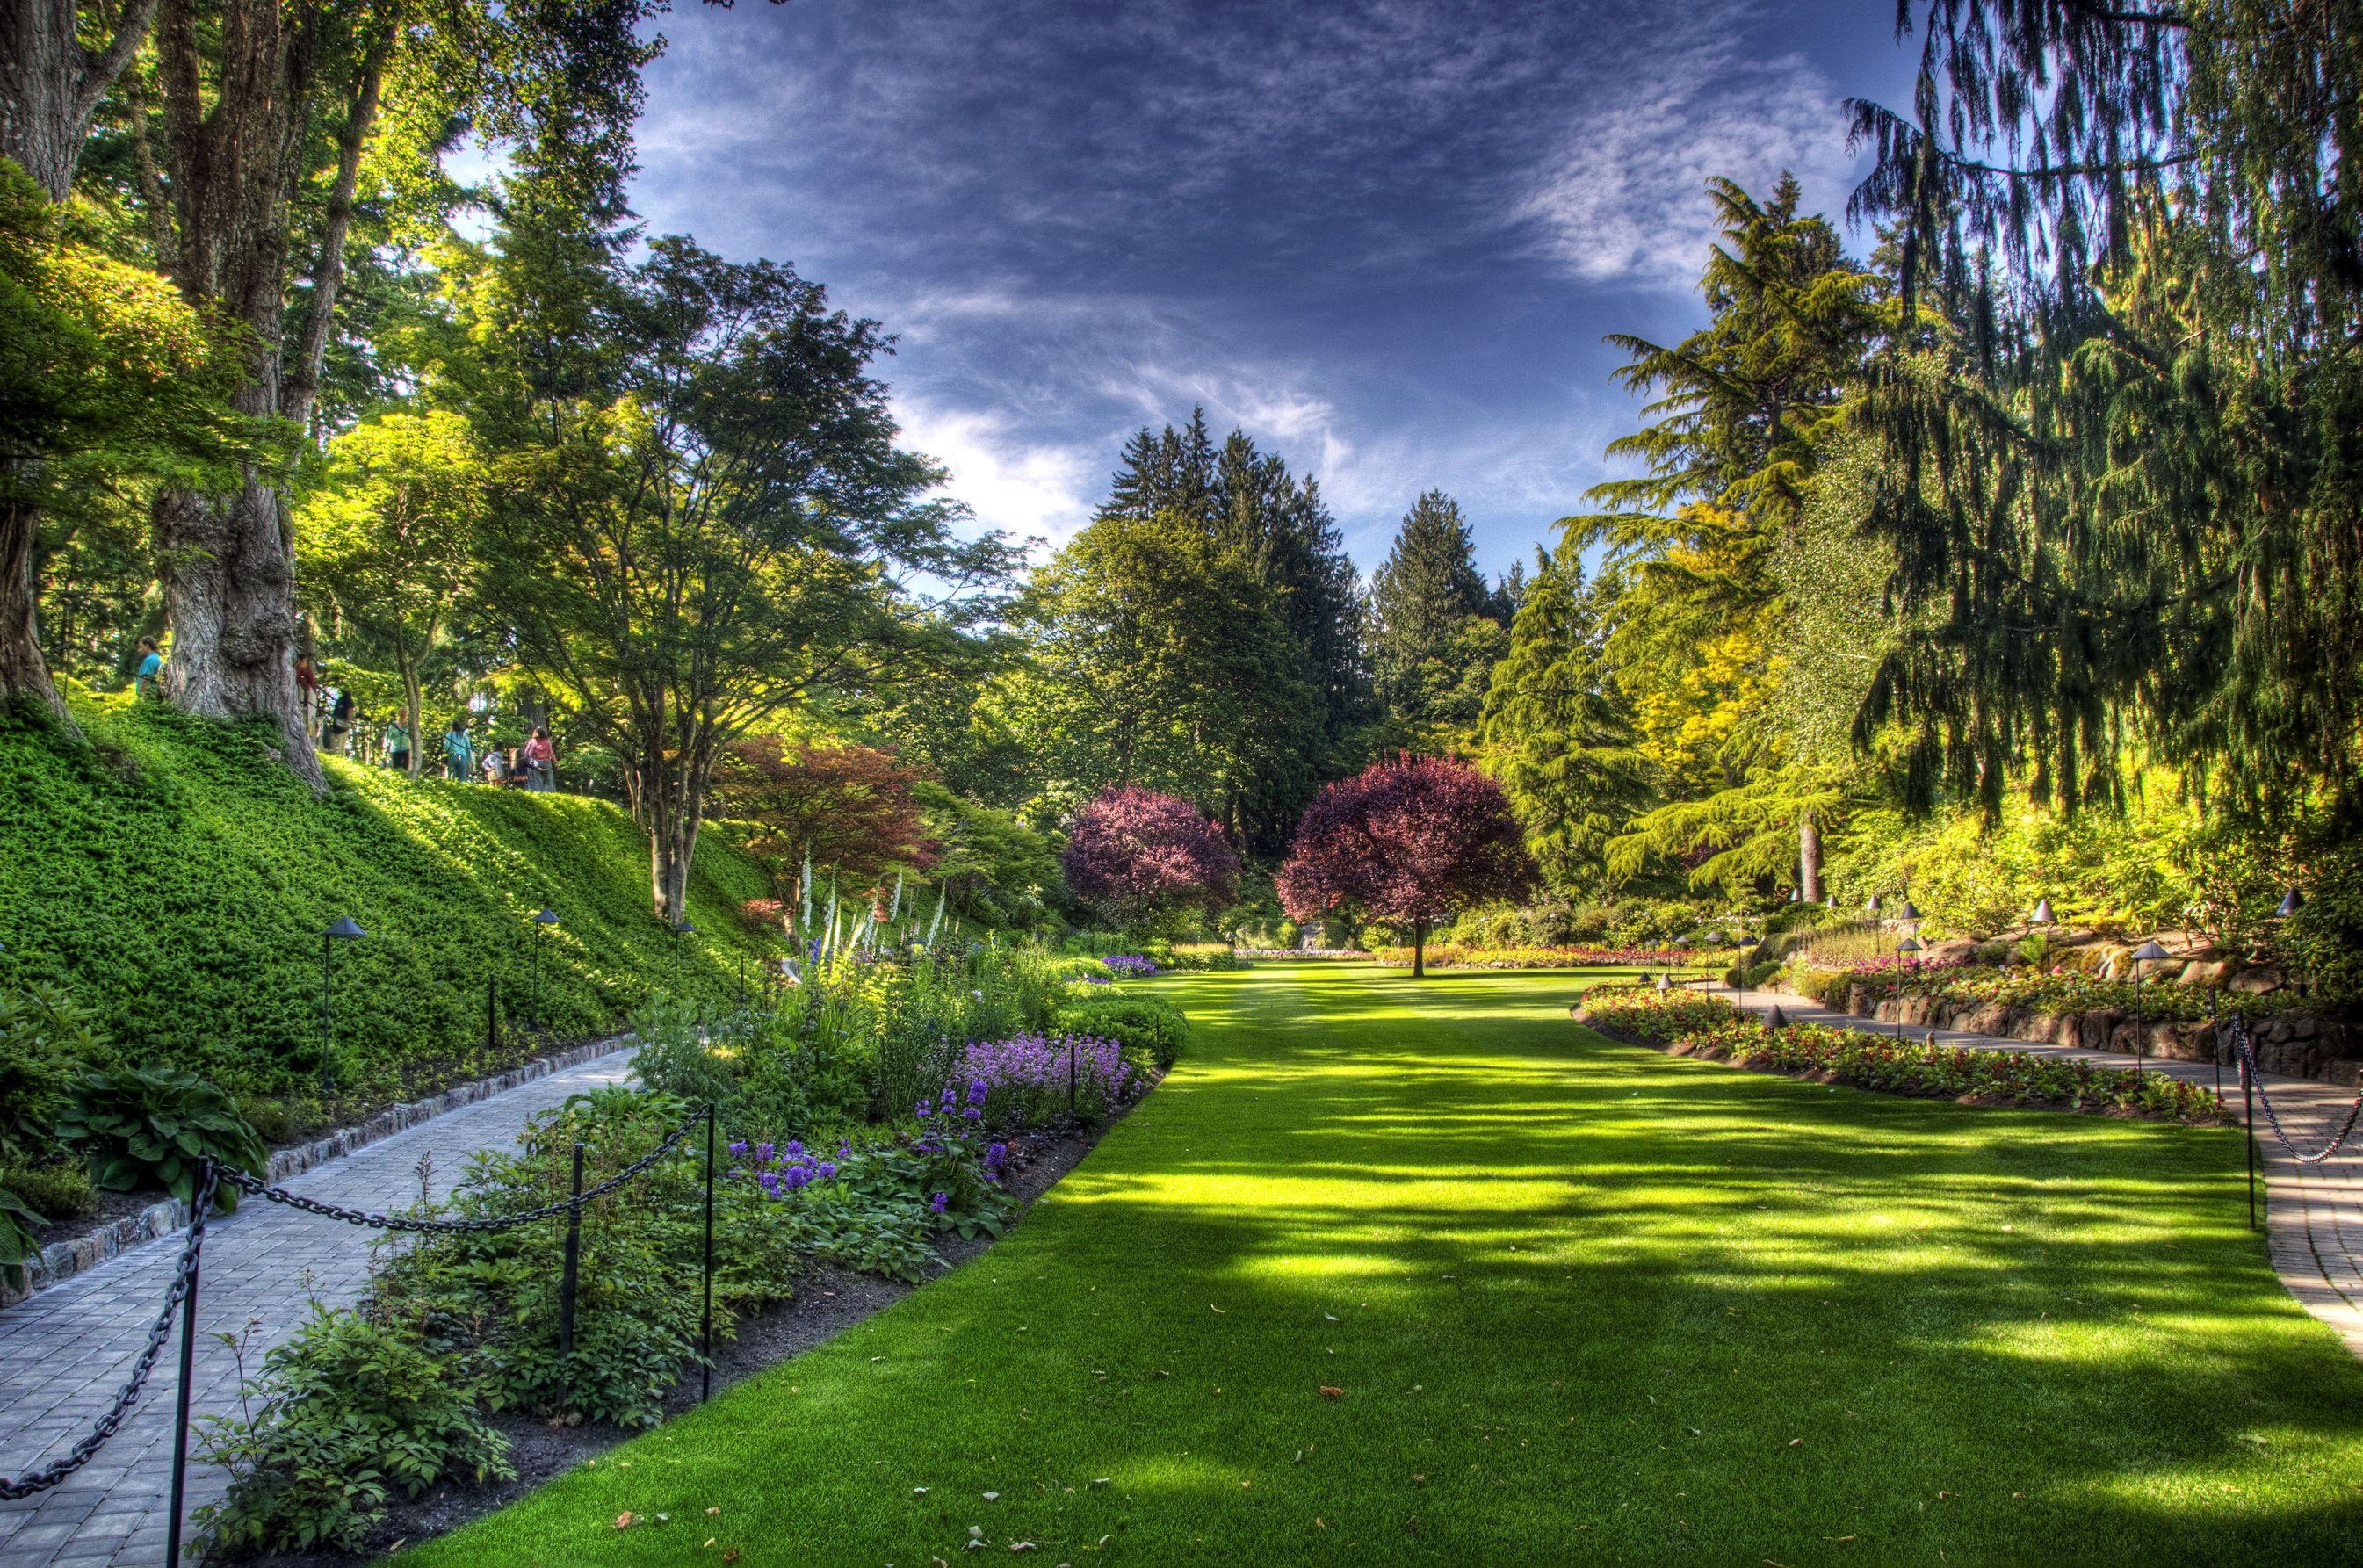 garden screensavers and wallpaper super garden images nm cp